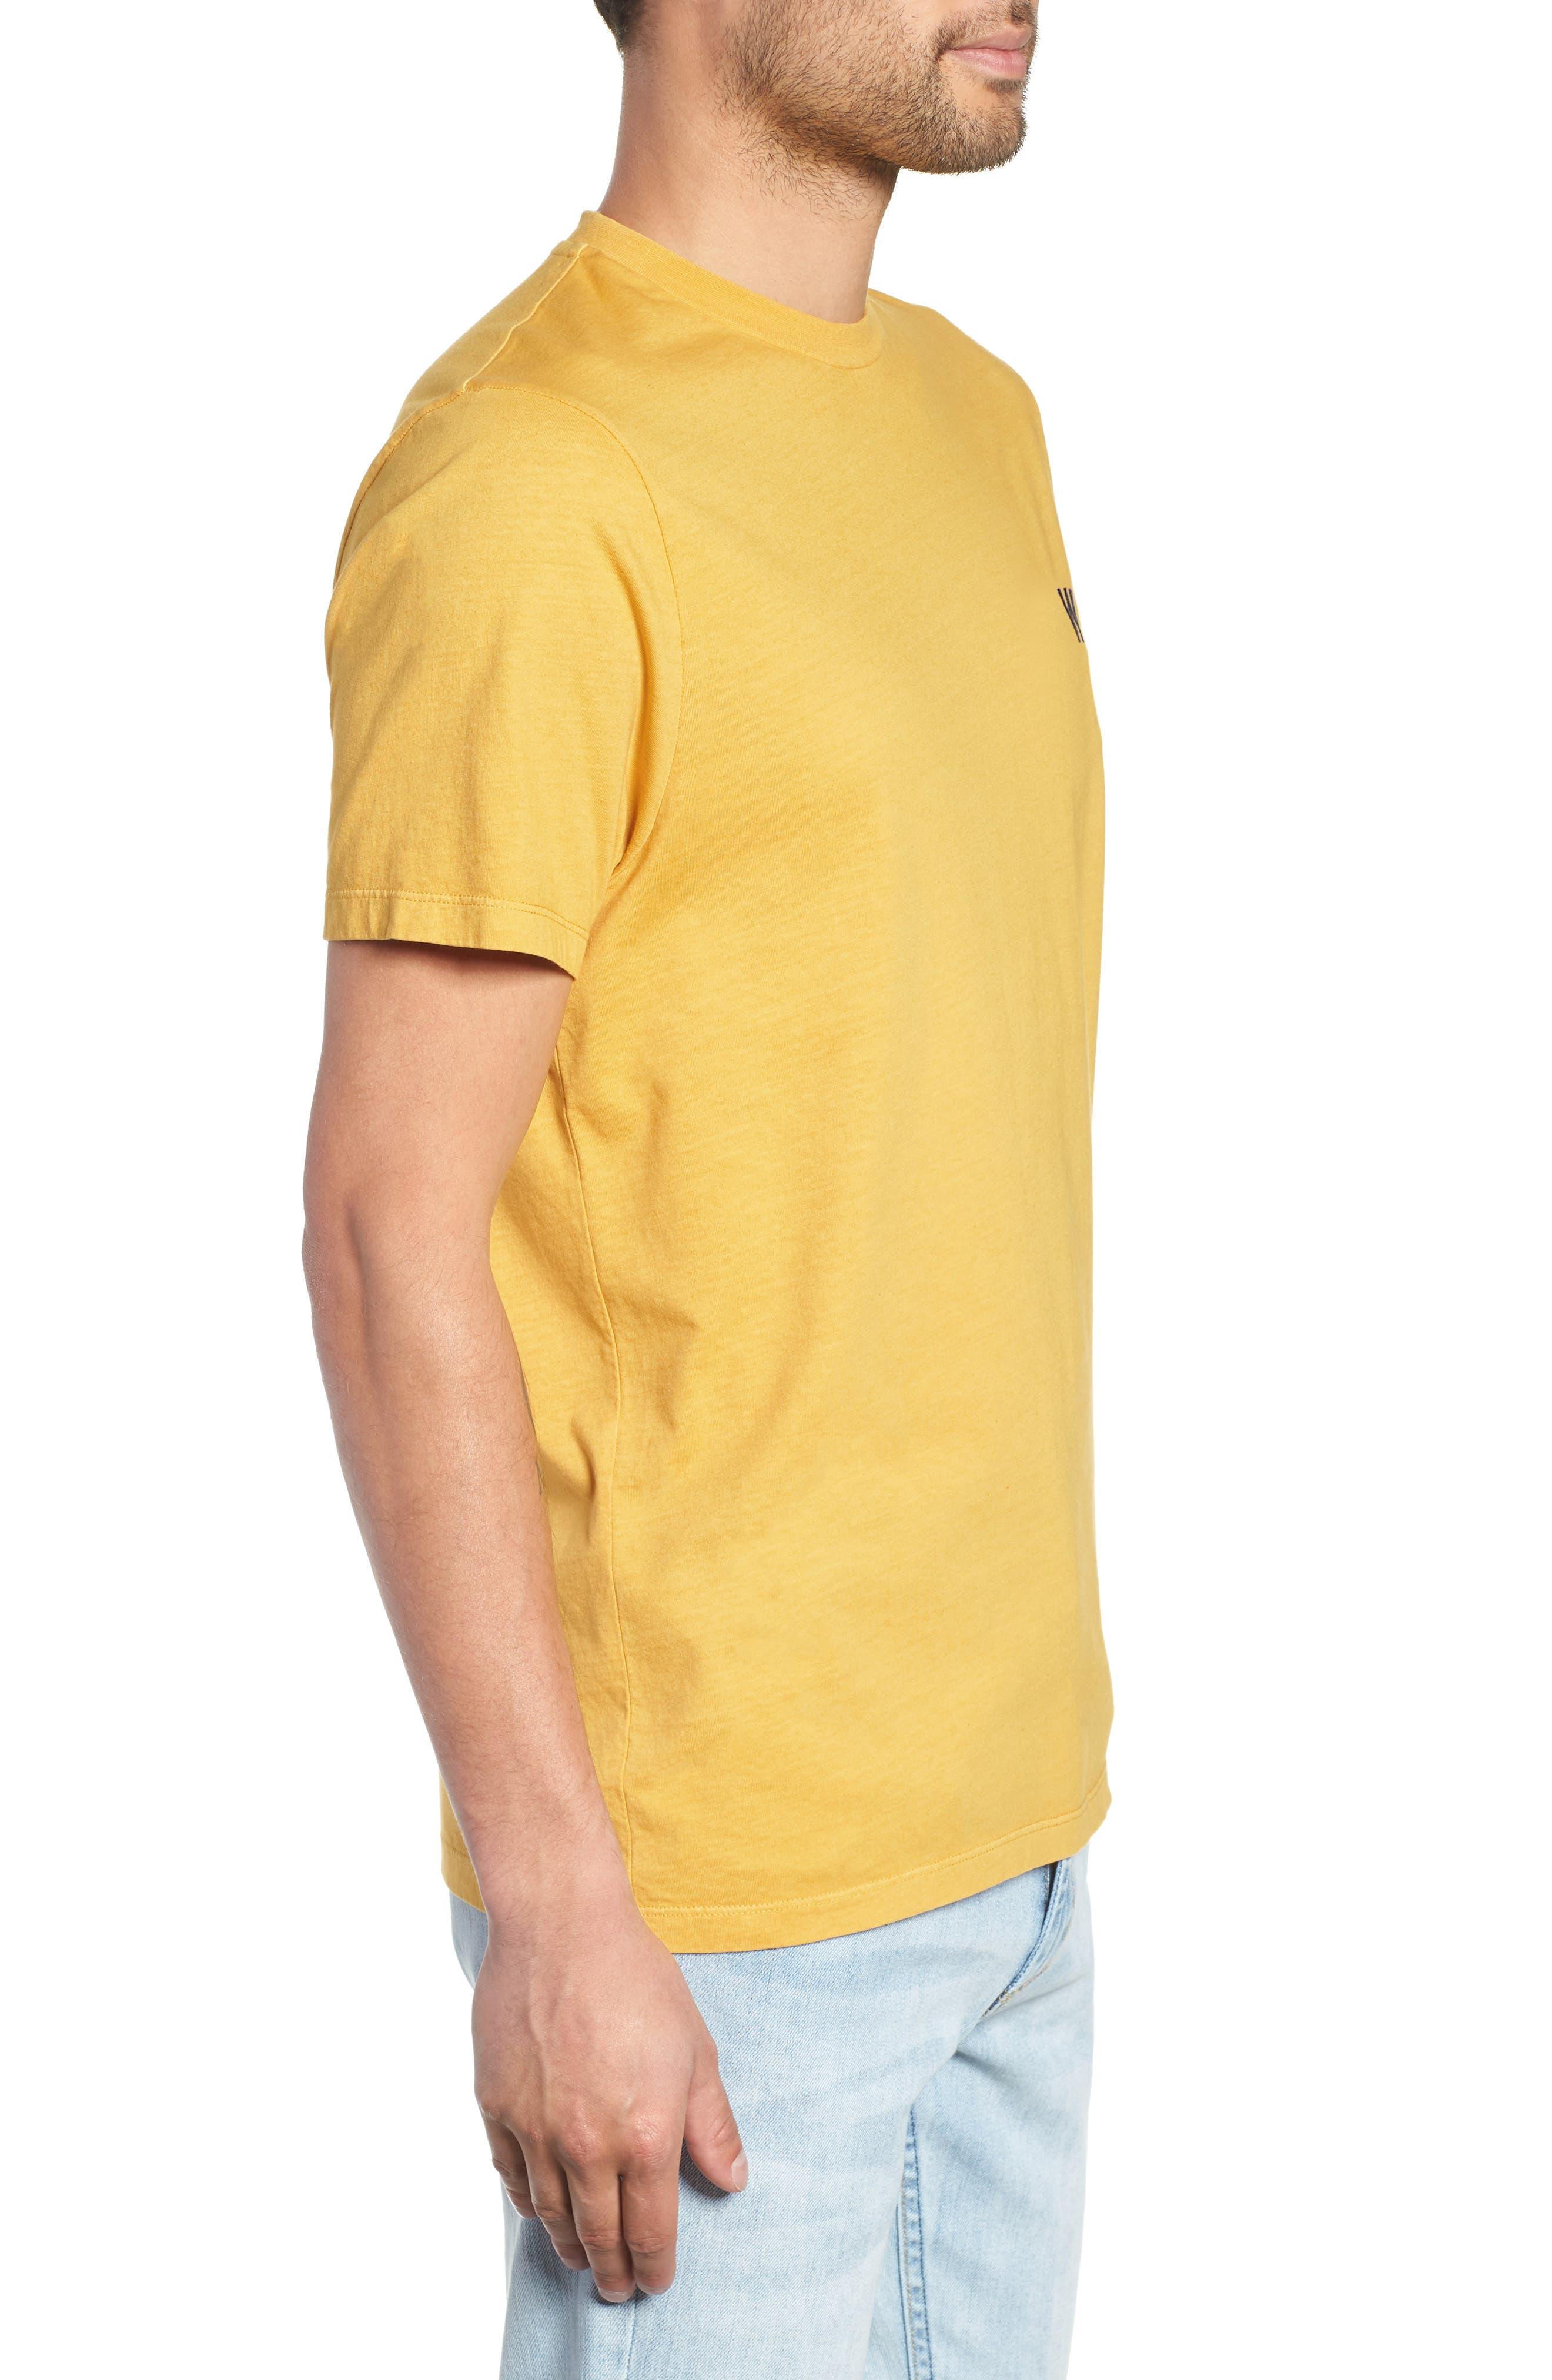 Reid T-Shirt,                             Alternate thumbnail 3, color,                             LEMON